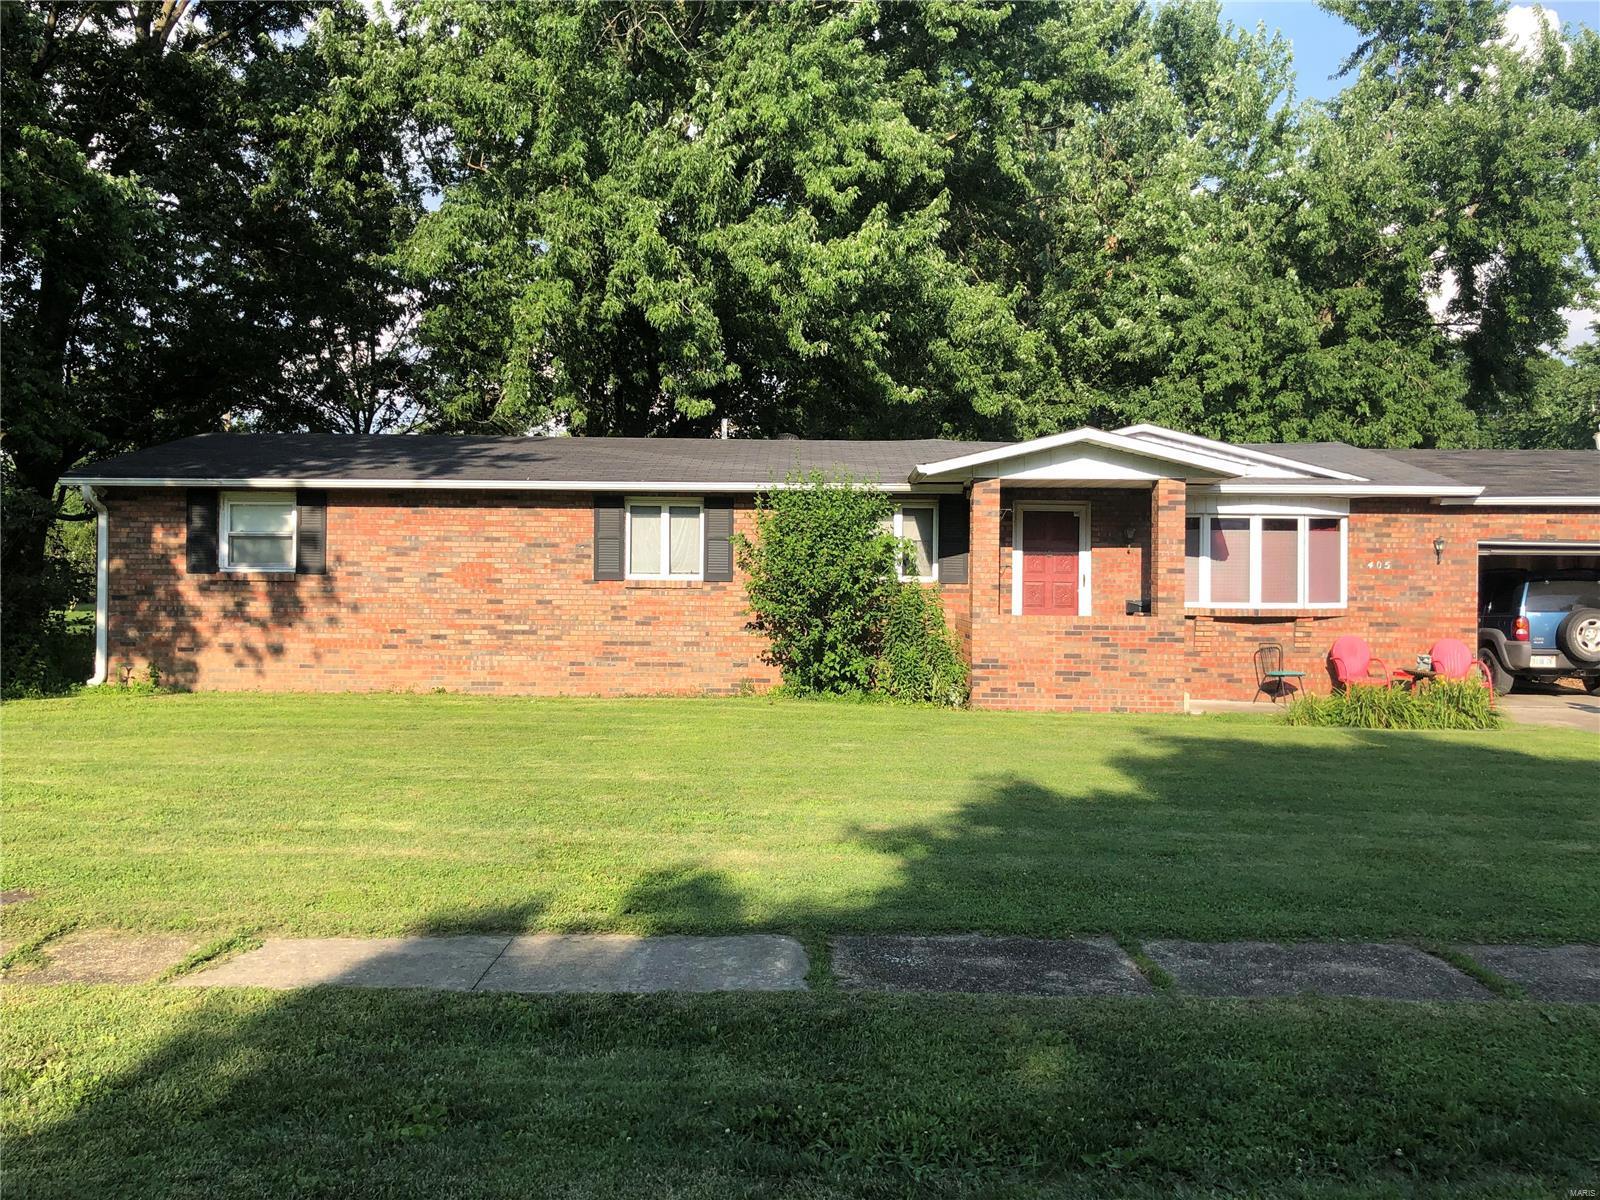 405 Harrington Property Photo - Carlinville, IL real estate listing